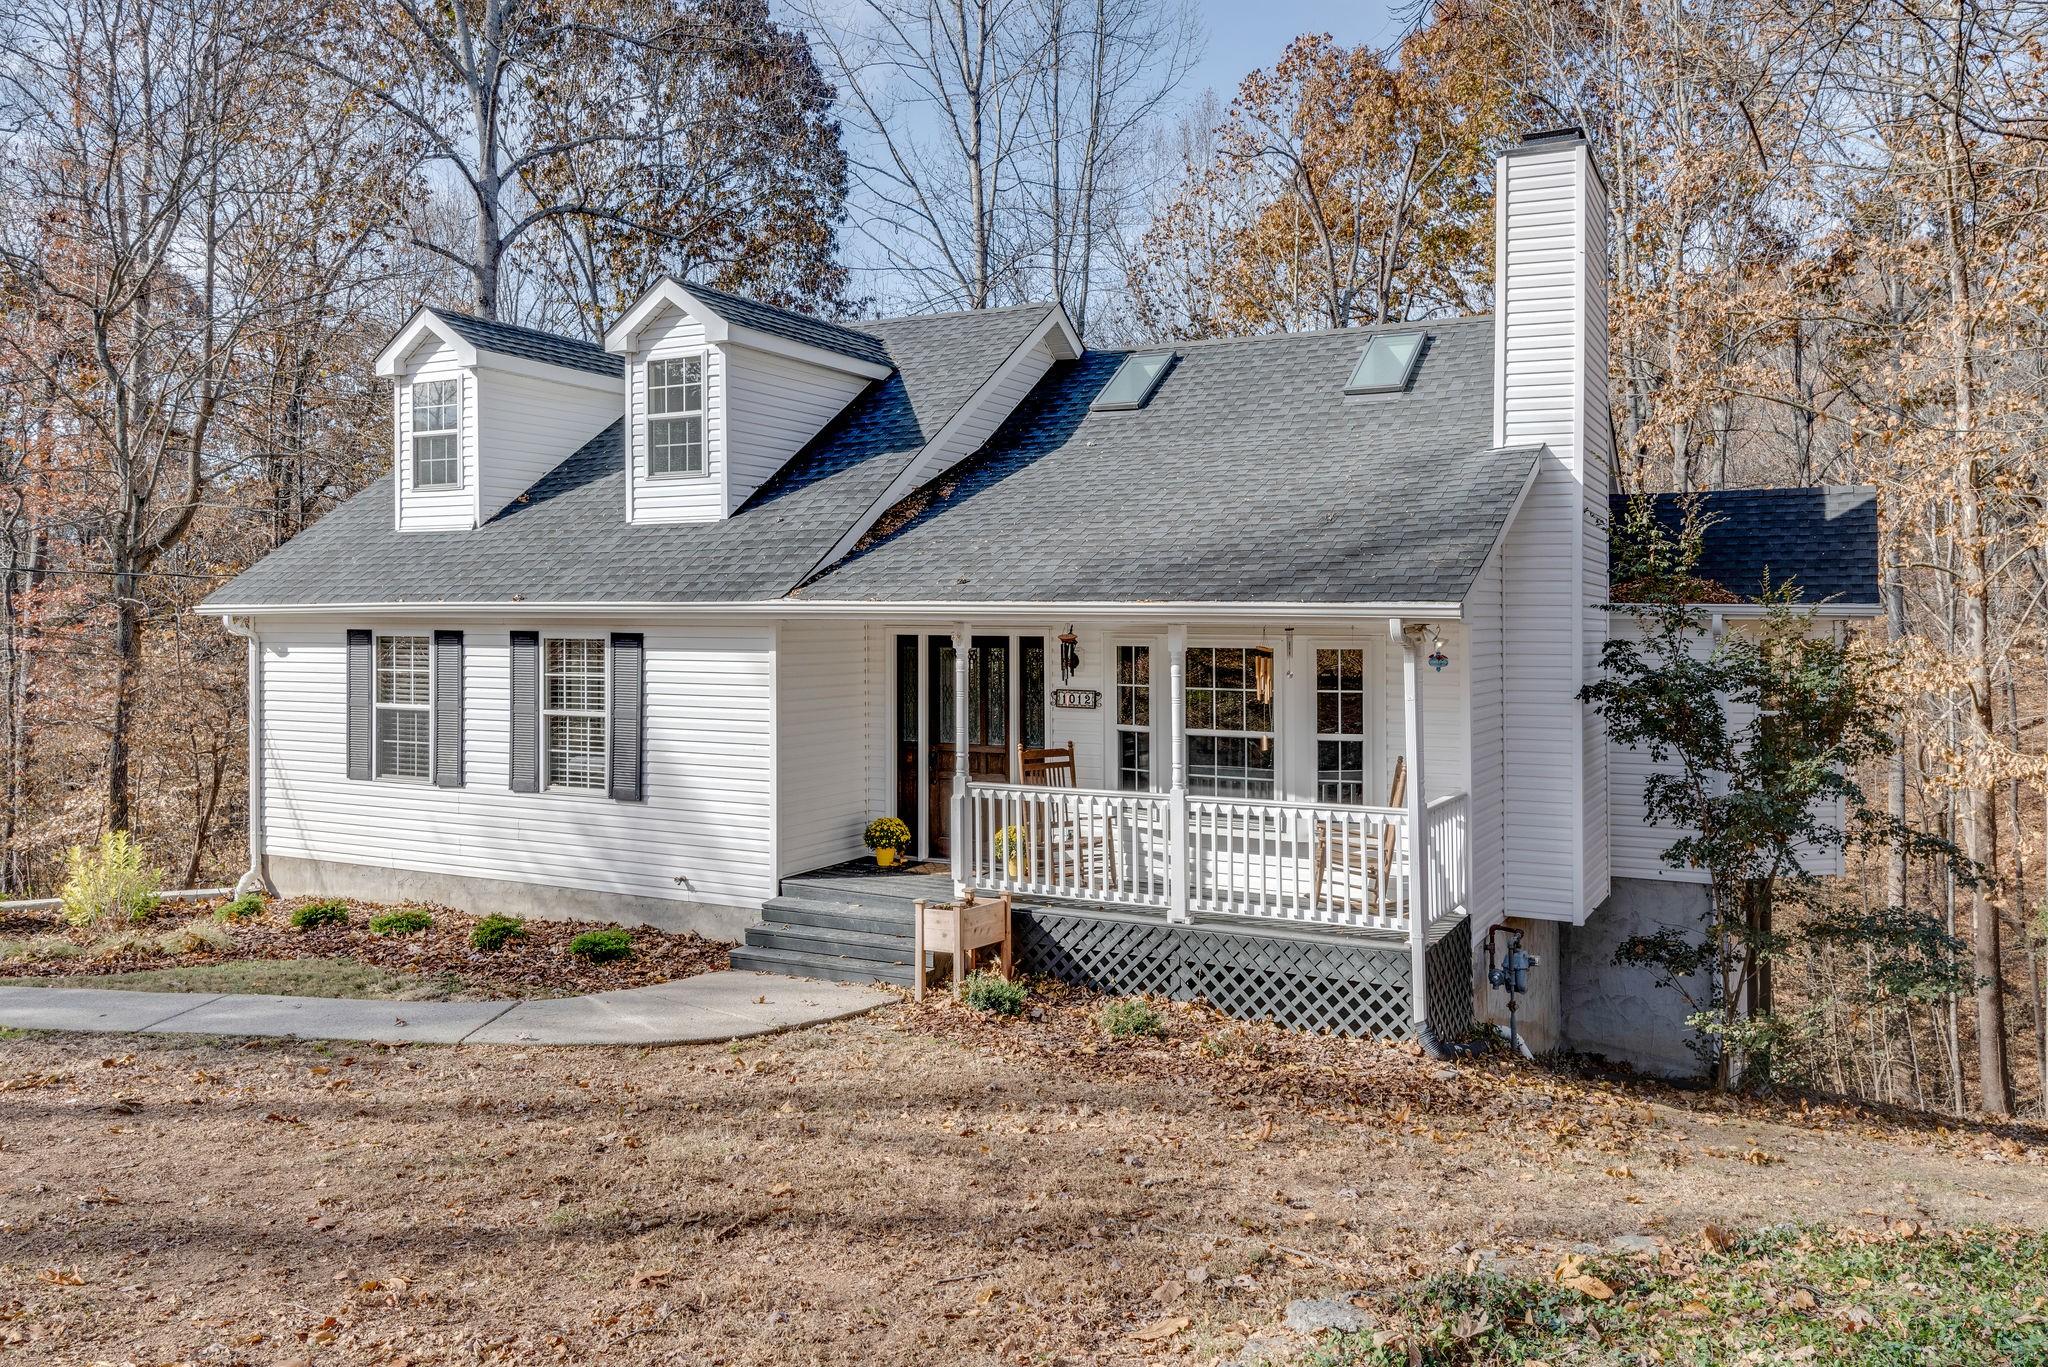 1012 Timber Ridge Ct, Kingston Springs, TN 37082 - Kingston Springs, TN real estate listing